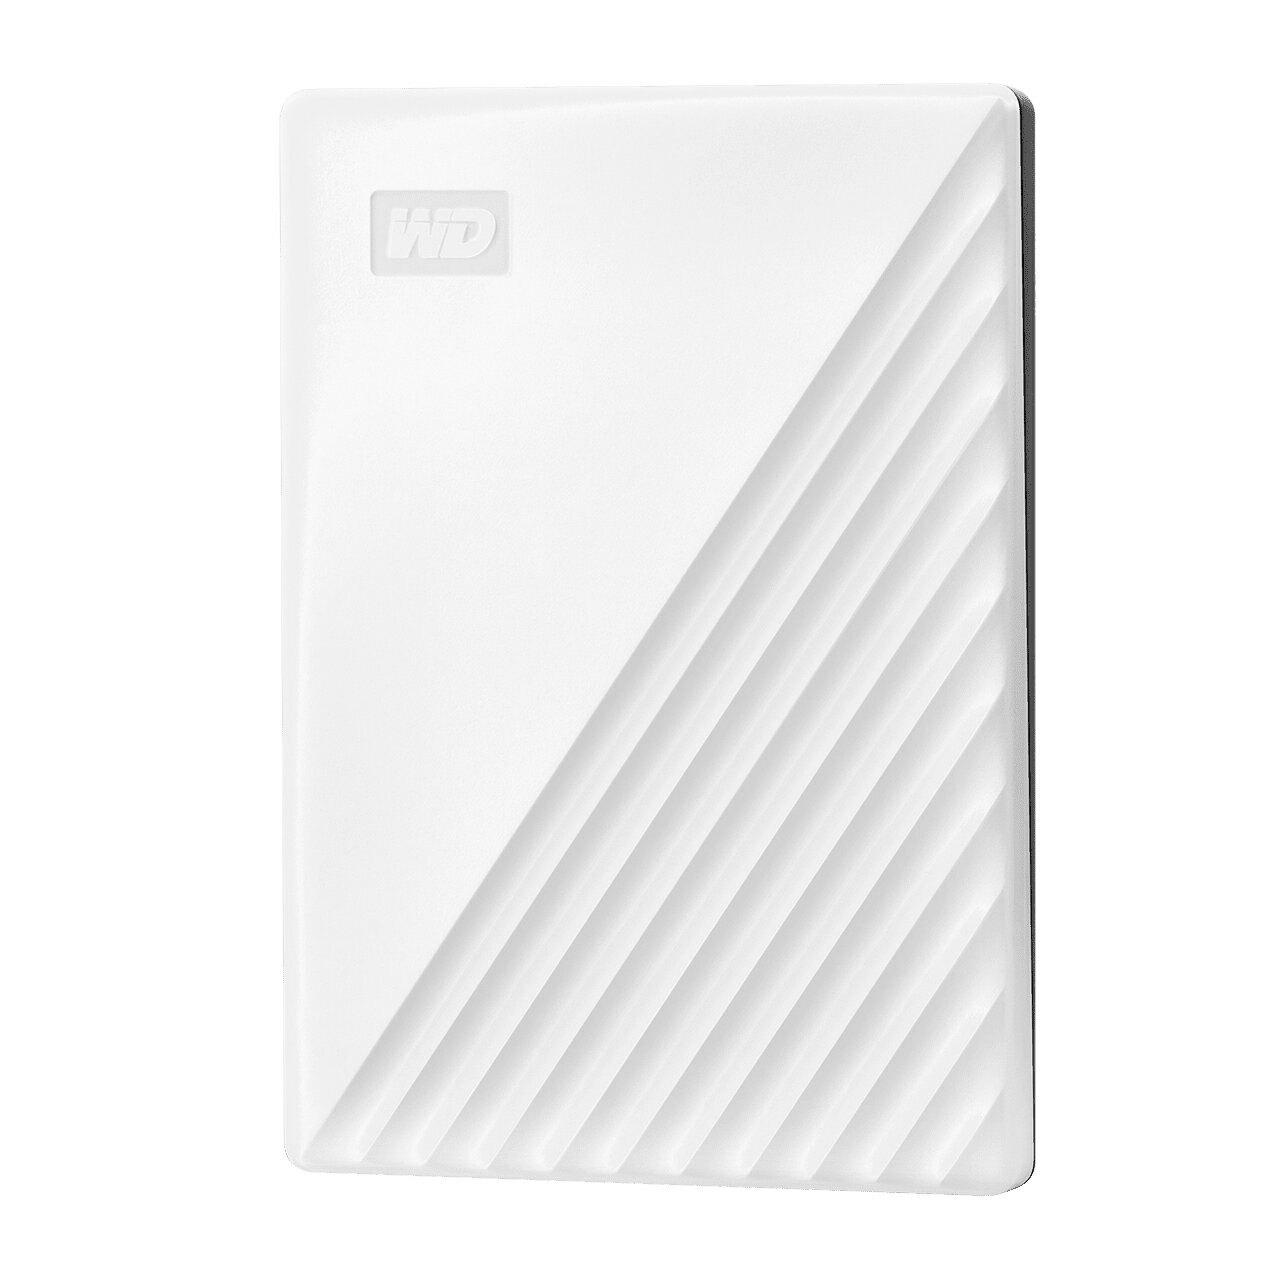 【WD 威騰】My Passport 2TB 2.5吋行動硬碟-白【三井3C】